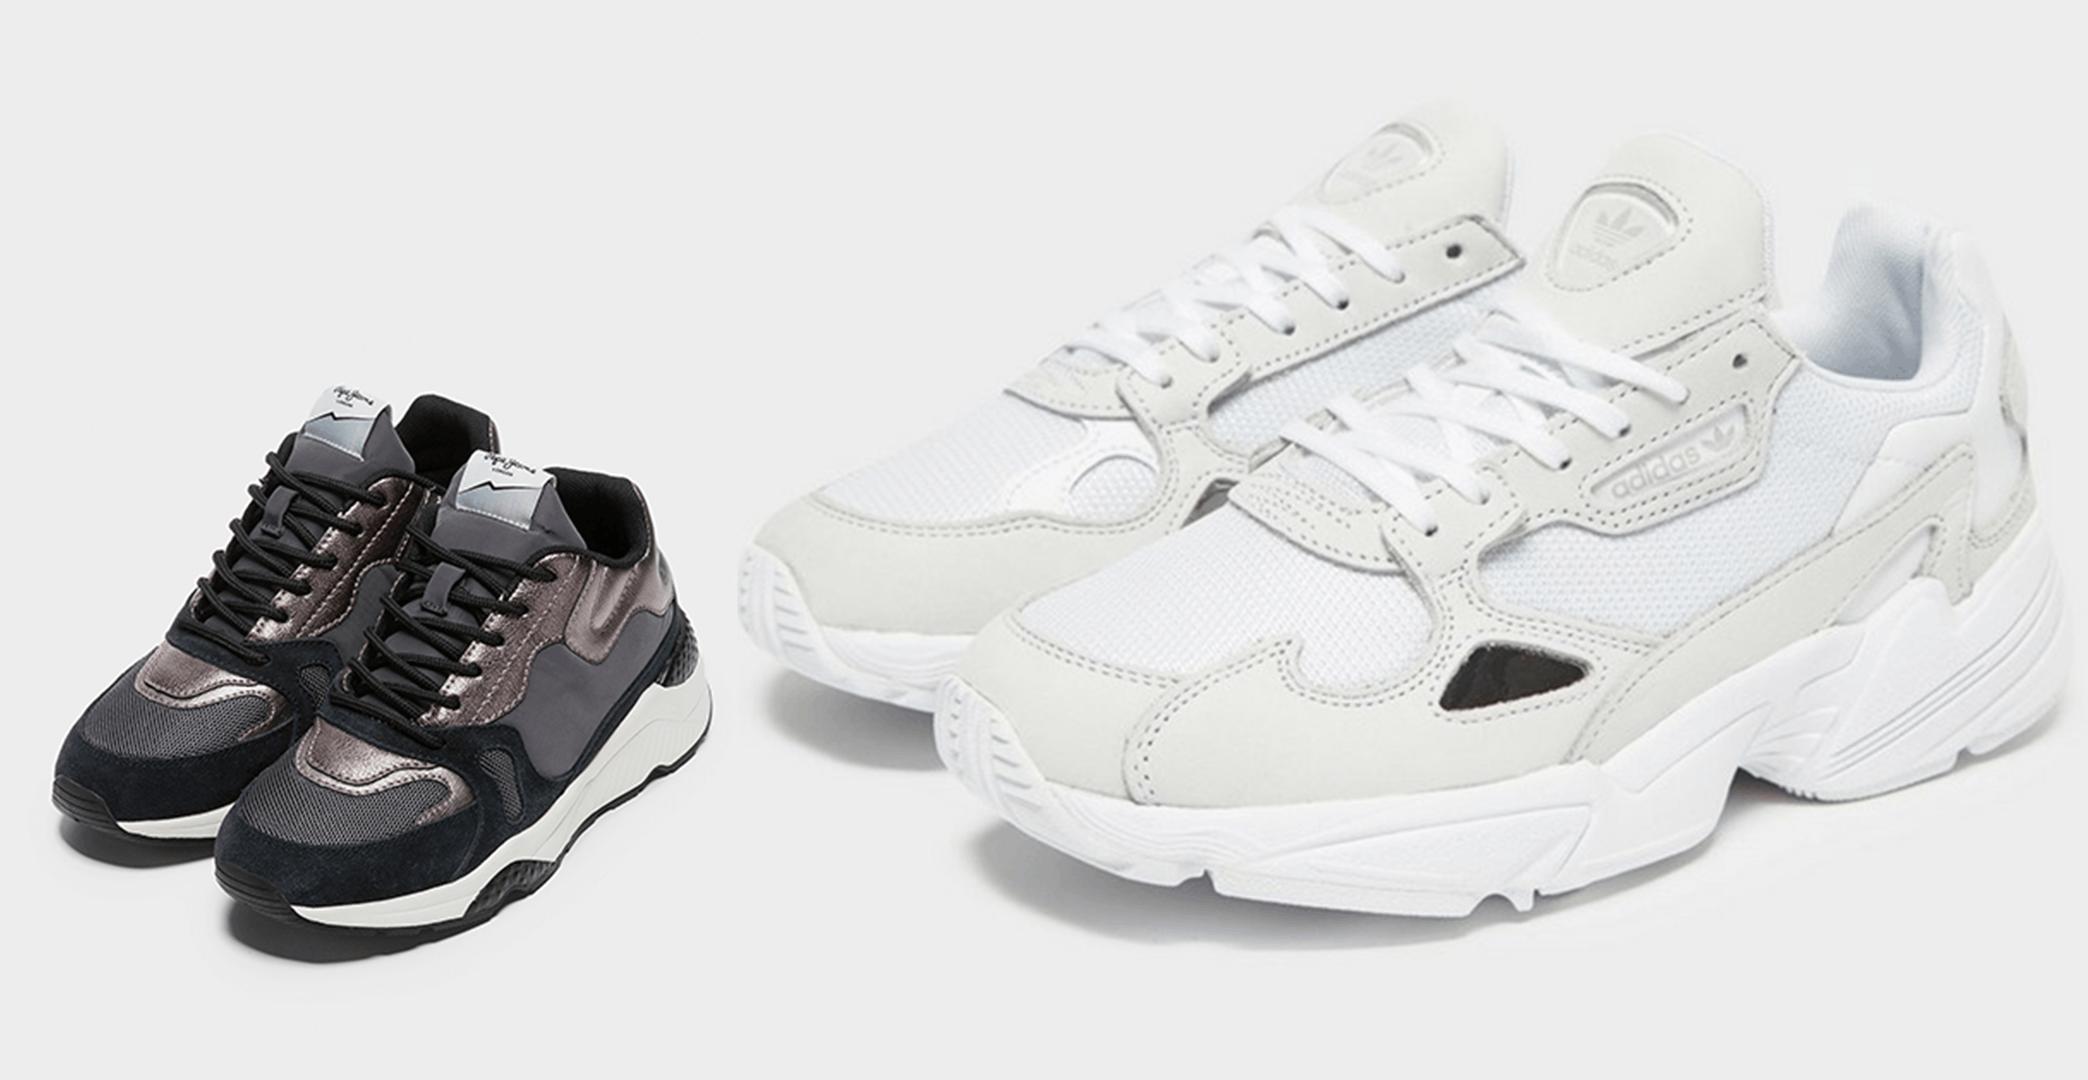 1 - Sapatilhas Combinadas Harlow Up Run, Pepe Jeans, 85€ | 2 - Sapatilhas Falcon, Adidas, 99,95€